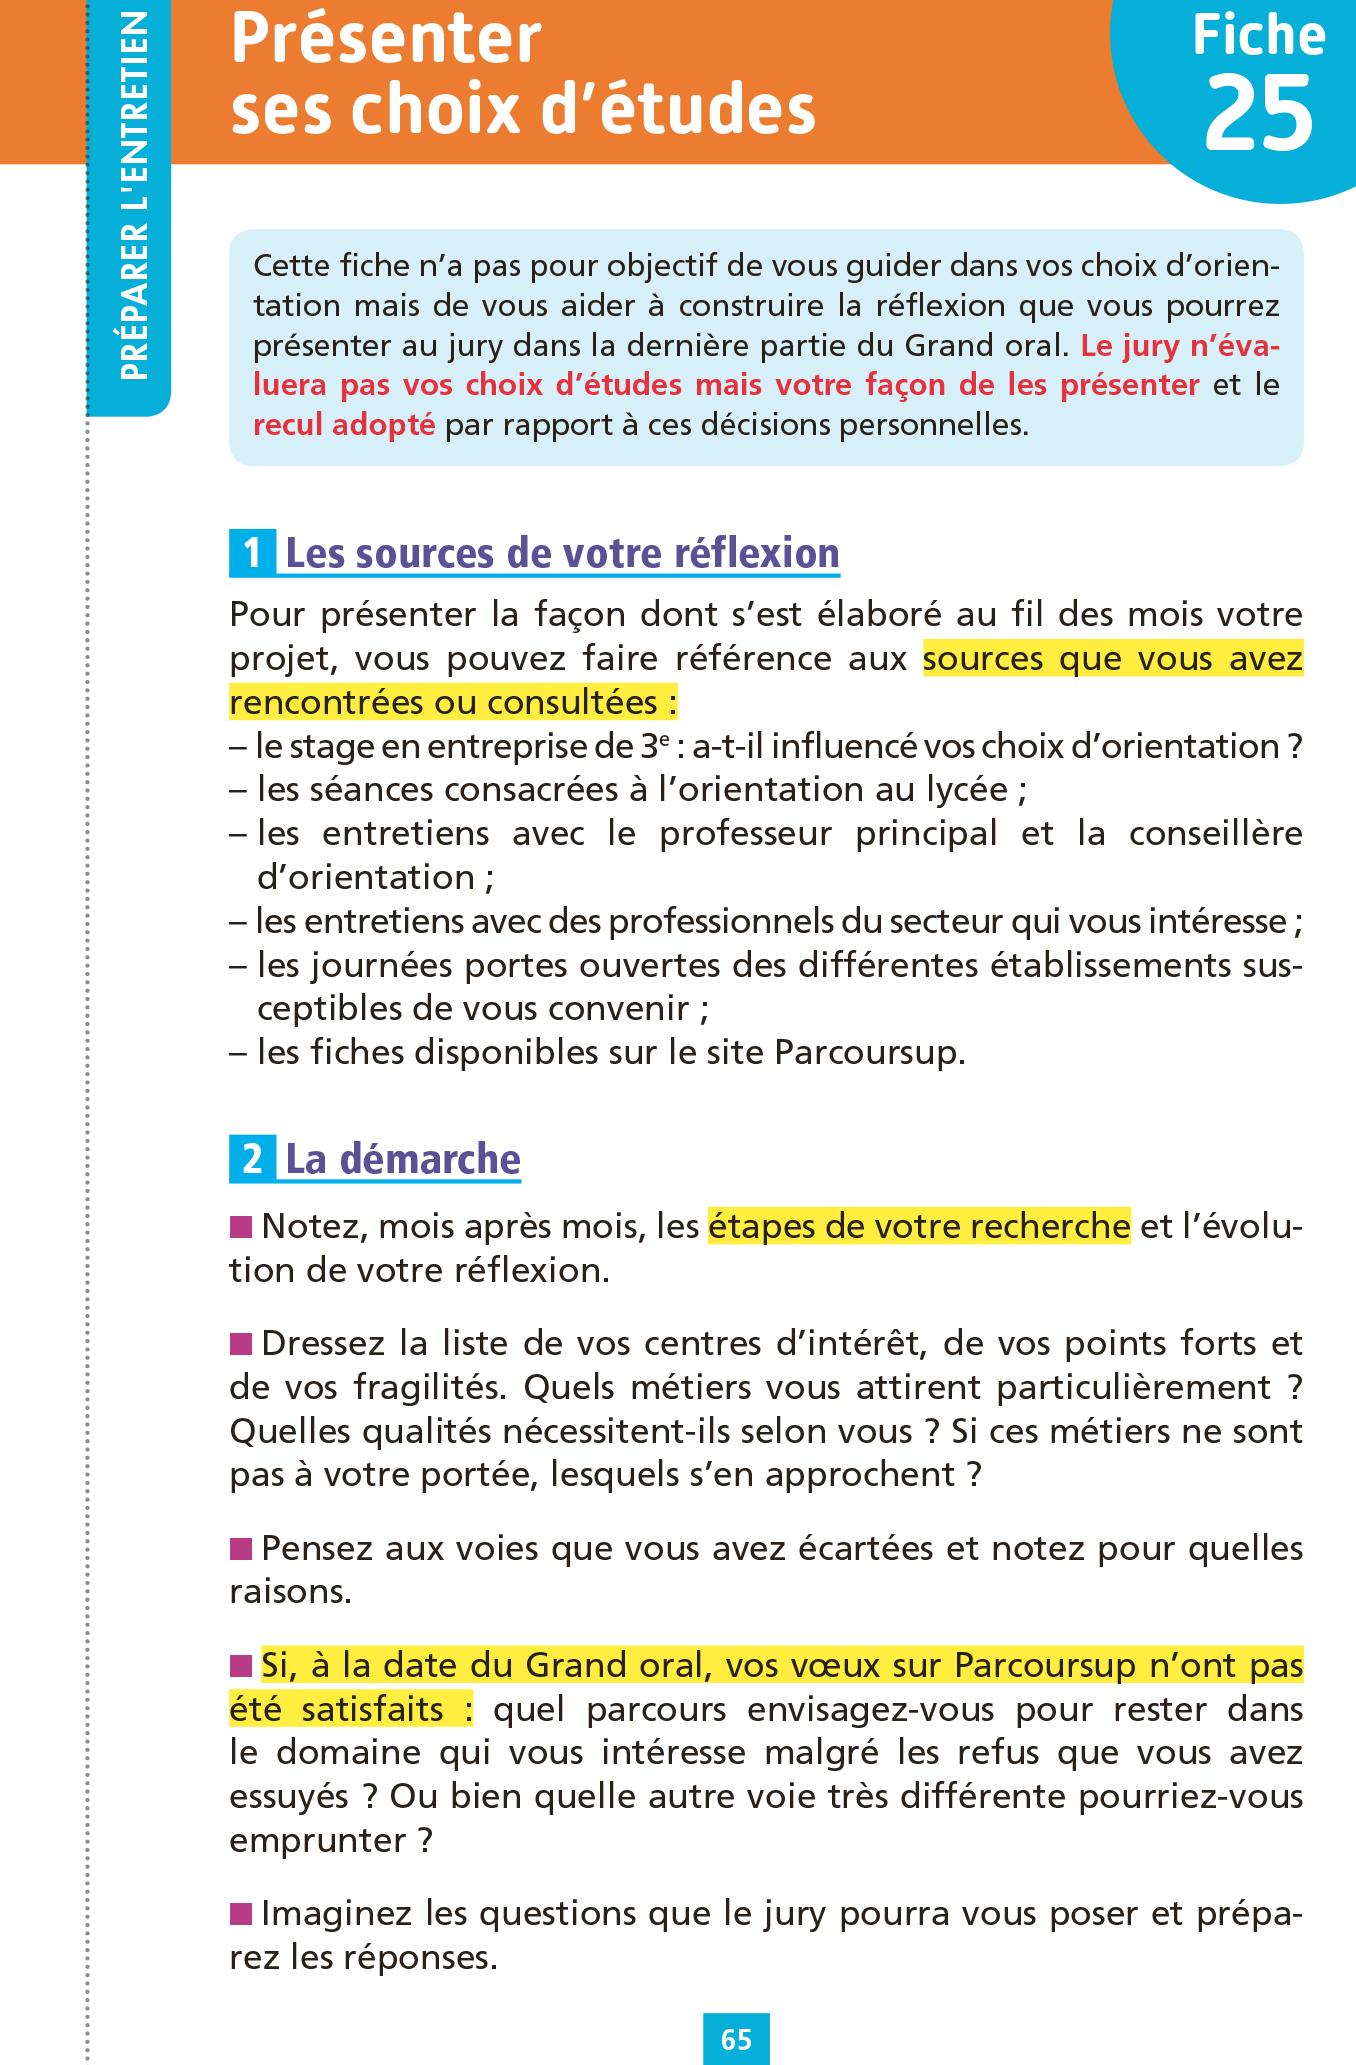 Objectif BAC - Fiches Grand oral du Bac   hachette.fr